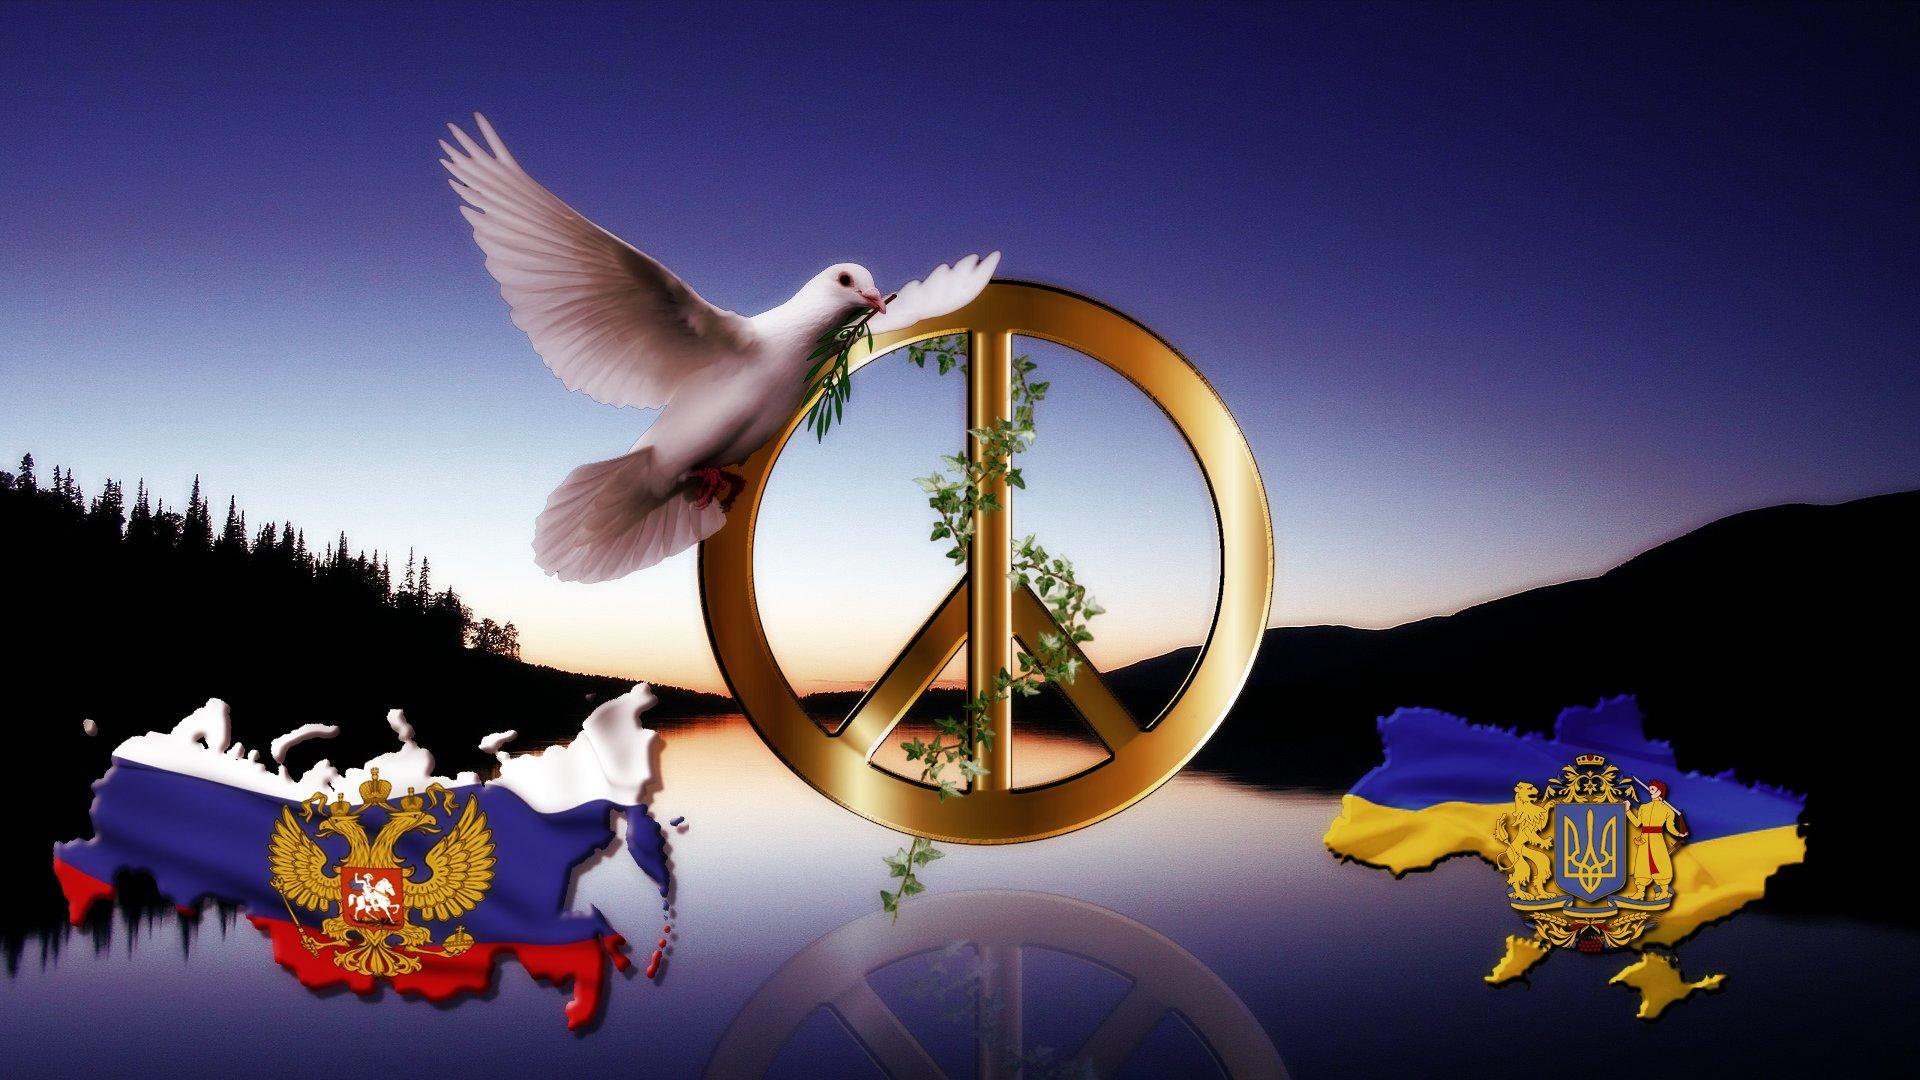 http://img-fotki.yandex.ru/get/4806/225452242.35/0_1400f1_d416bb76_orig